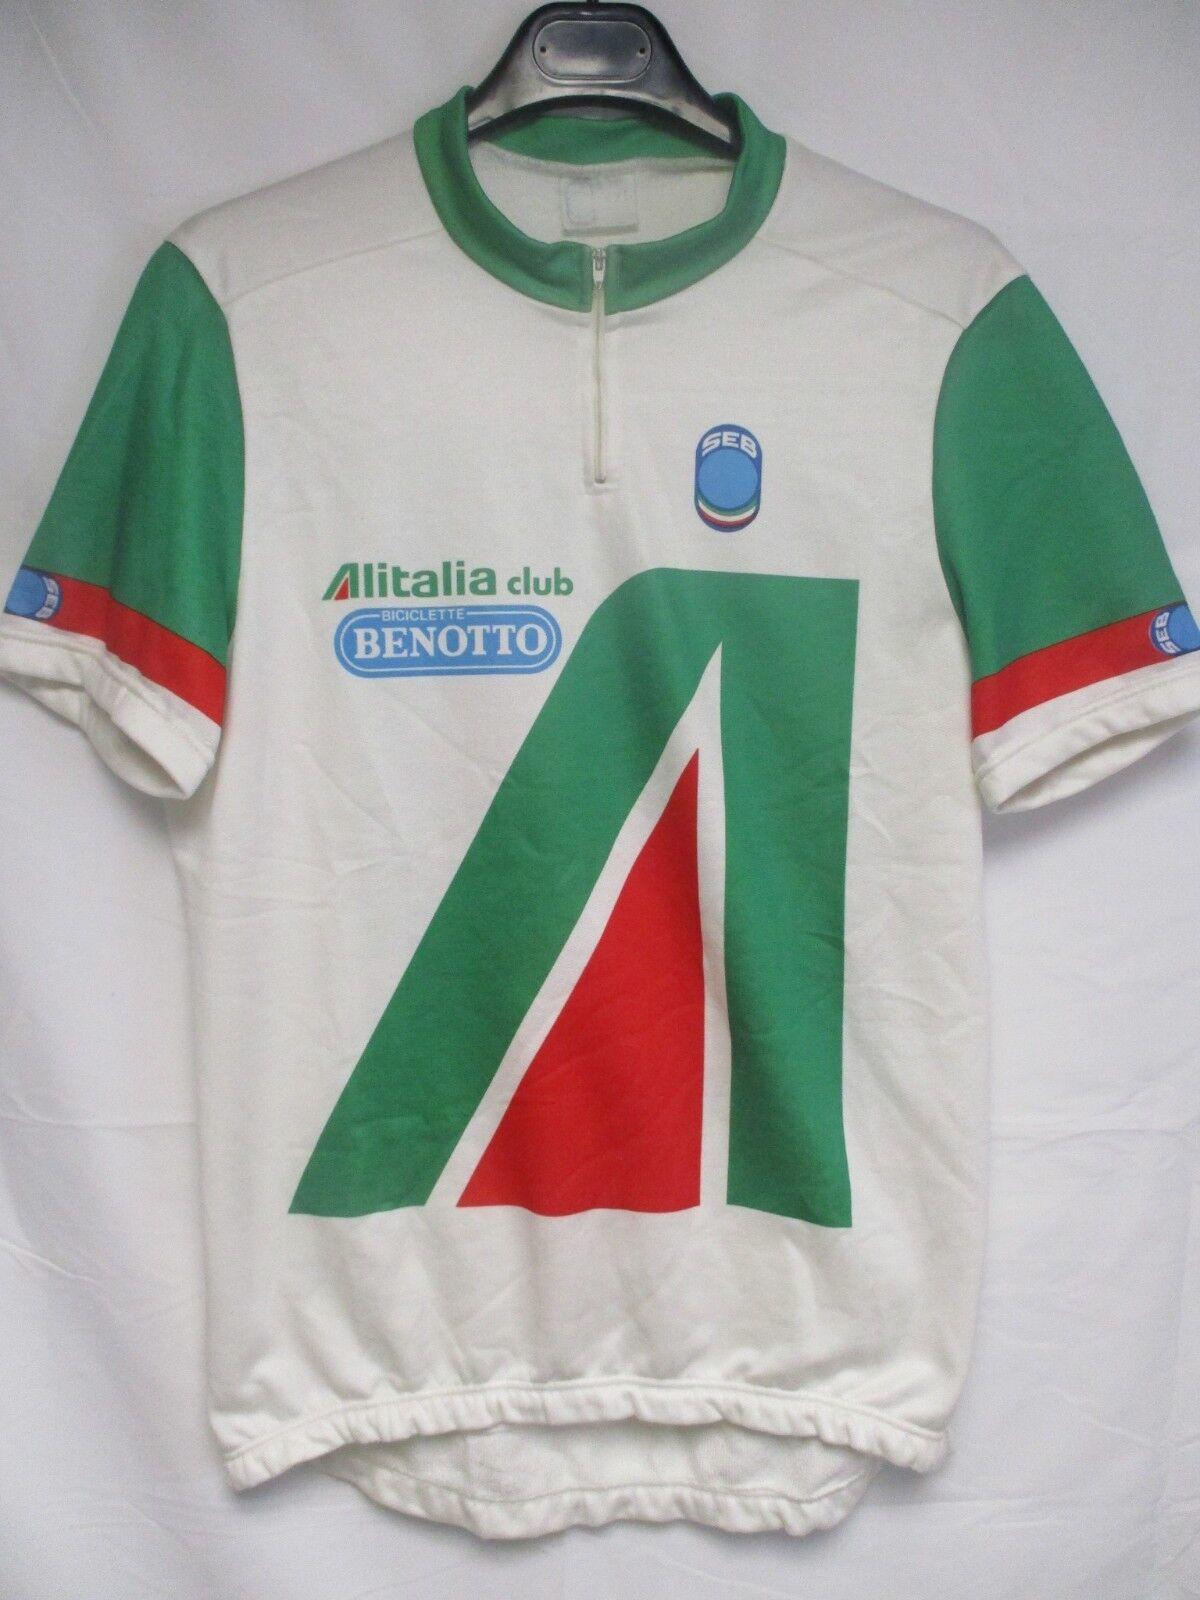 Maillot cycliste ALITALIA club BENOTTO maglia vintage SEB shirt jersey 80's XXL